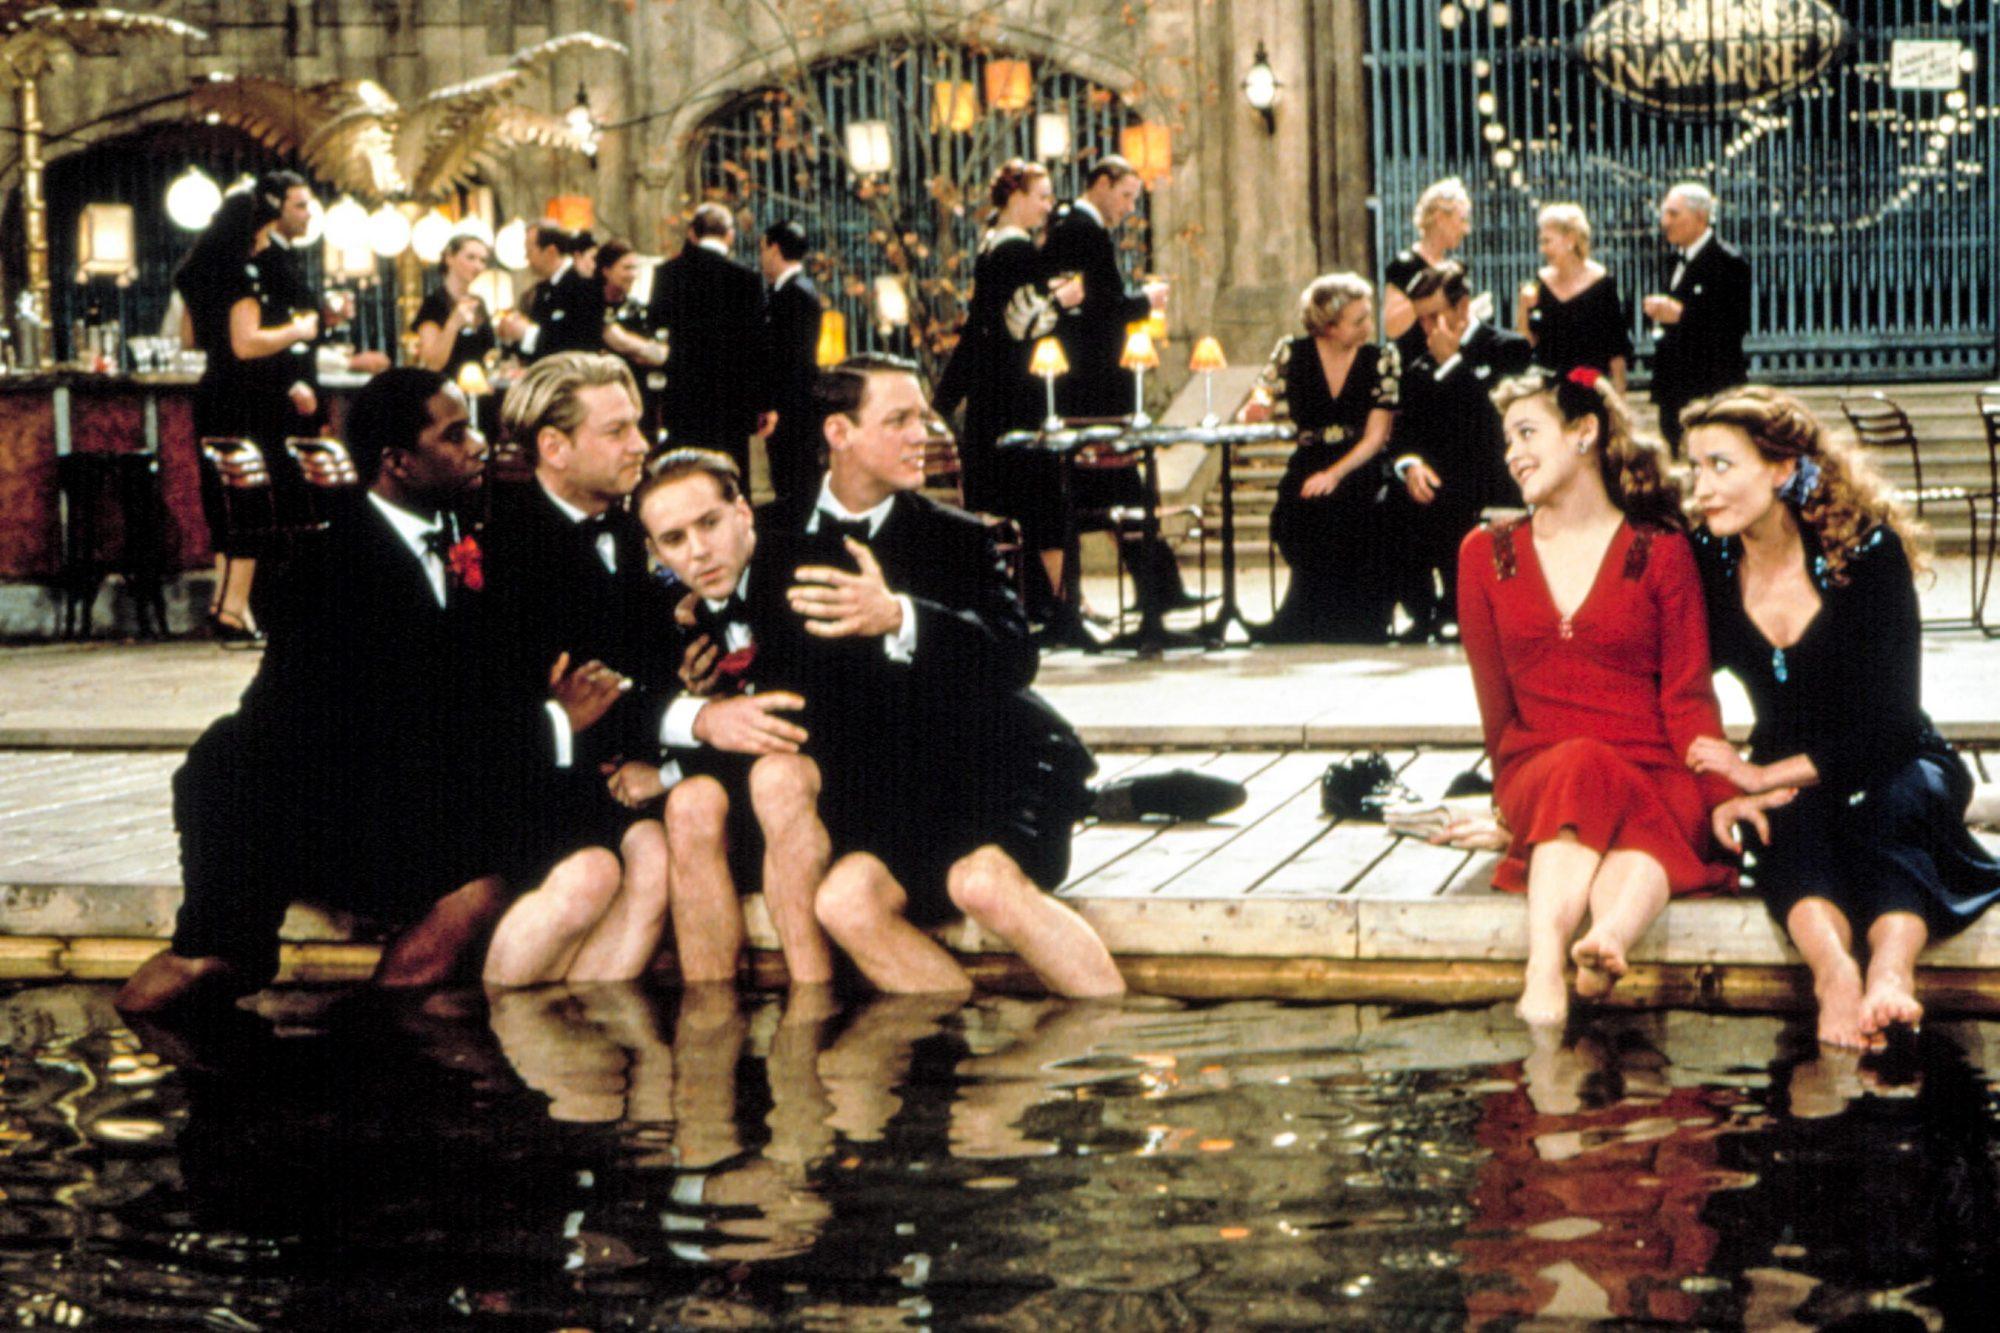 LOVE'S LABOUR'S LOST, Kenneth Branagh, Adrian Lester, Matthew Lillard, Alicia Silverstone, Natascha